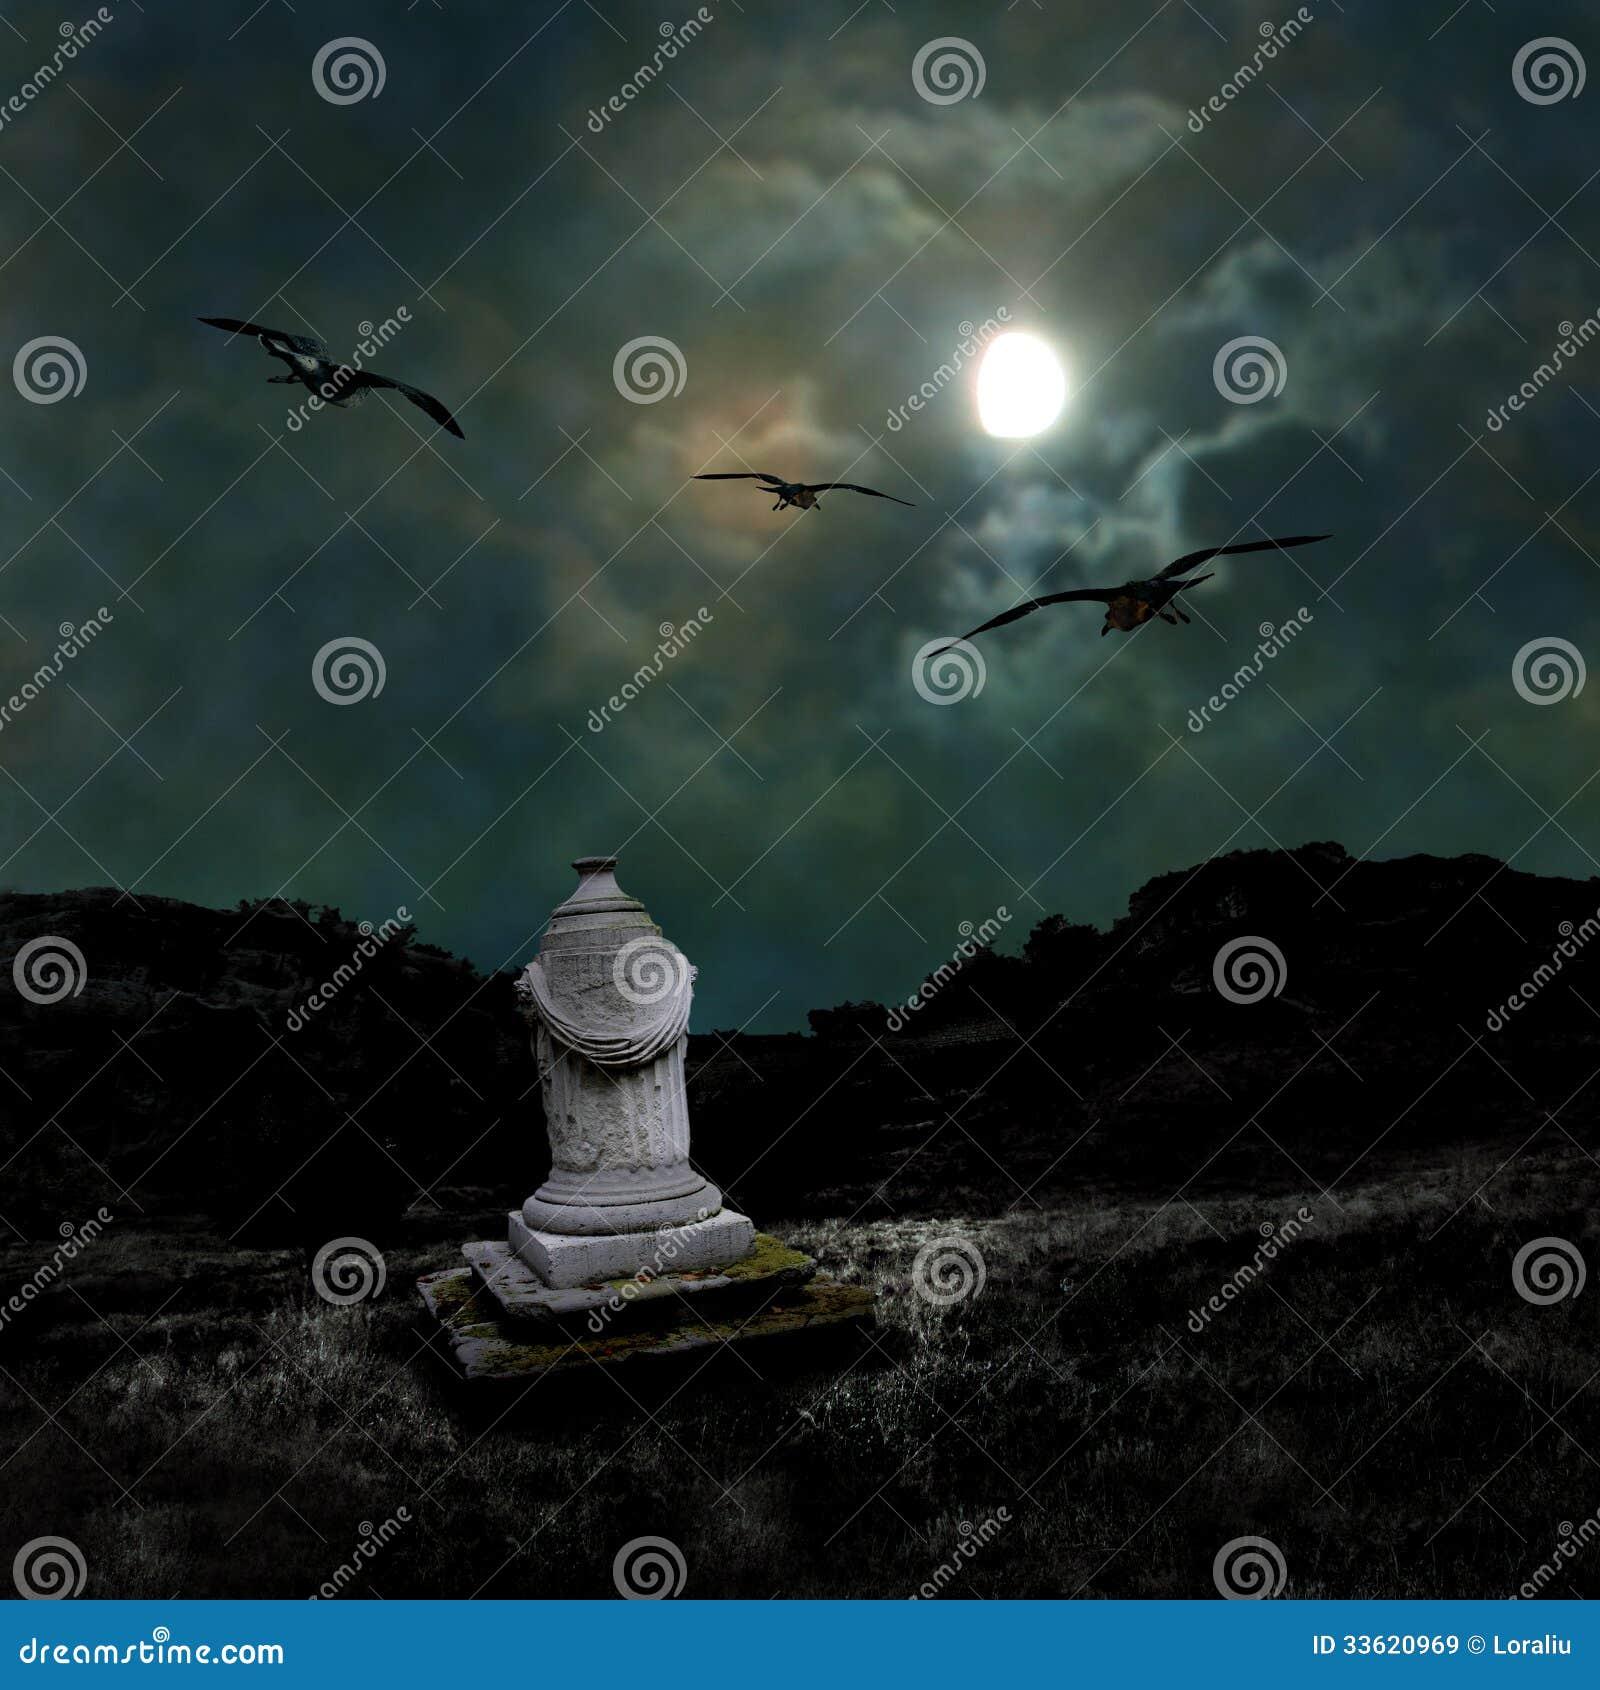 Ominous dark night in the dim moonlight